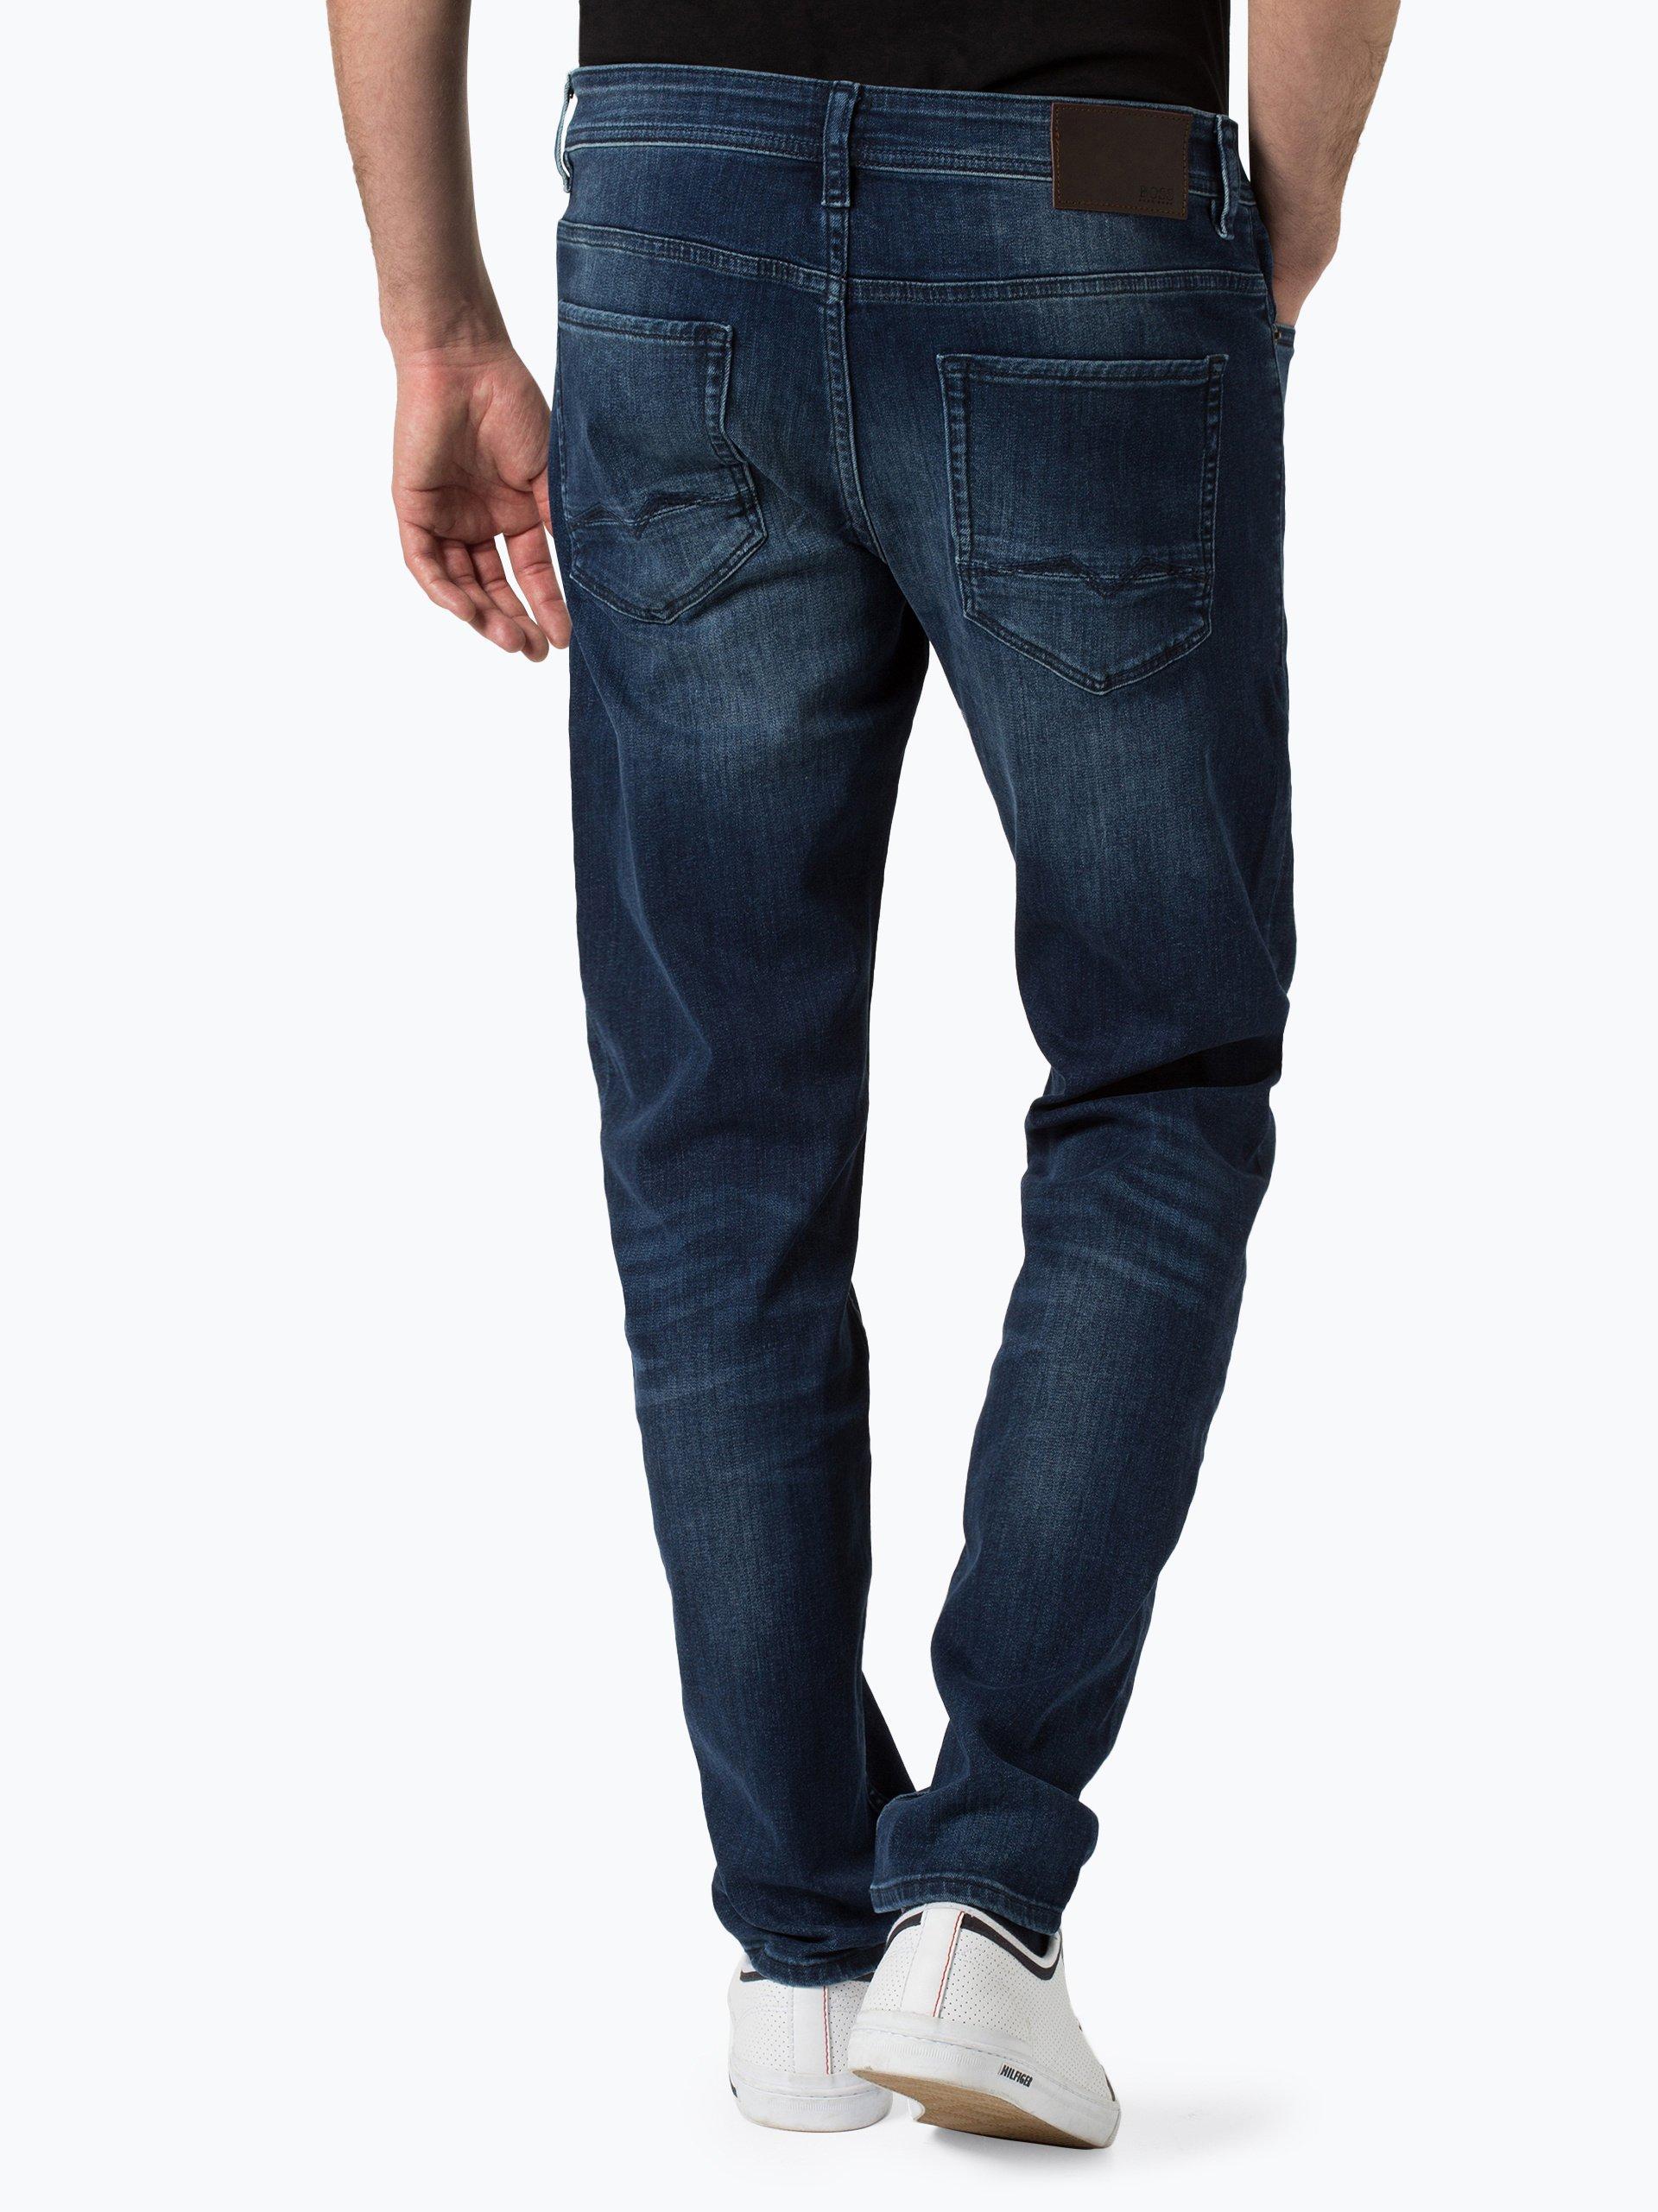 boss casual herren jeans orange90 marine blau uni online kaufen vangraaf com. Black Bedroom Furniture Sets. Home Design Ideas